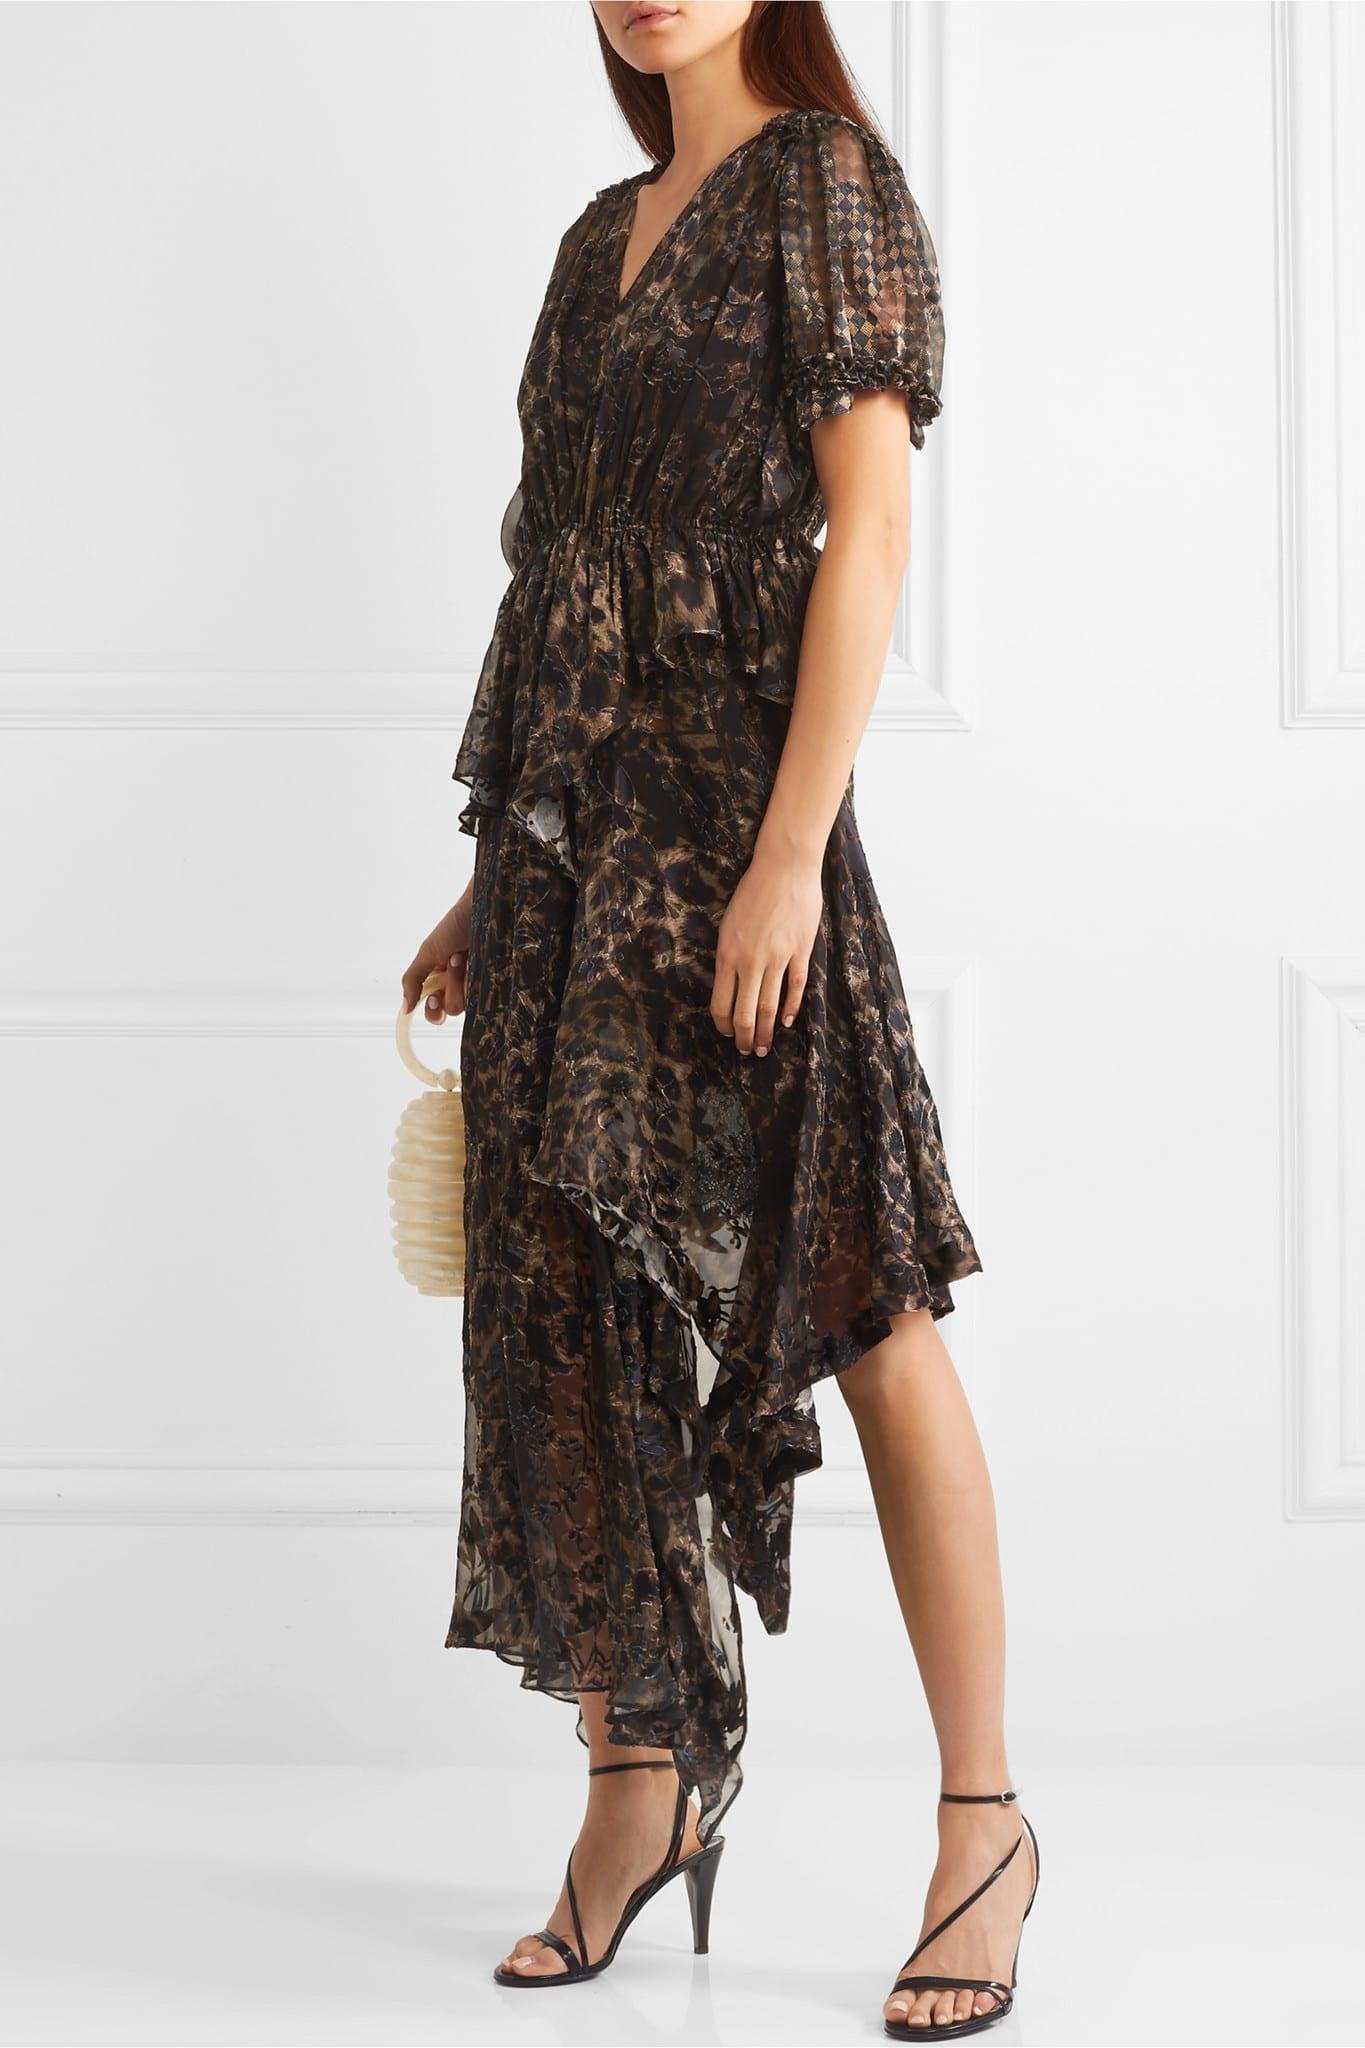 PREEN BY THORNTON BREGAZZI Esther Asymmetric Ruffled Leopard-print Devoré-chiffon Dress